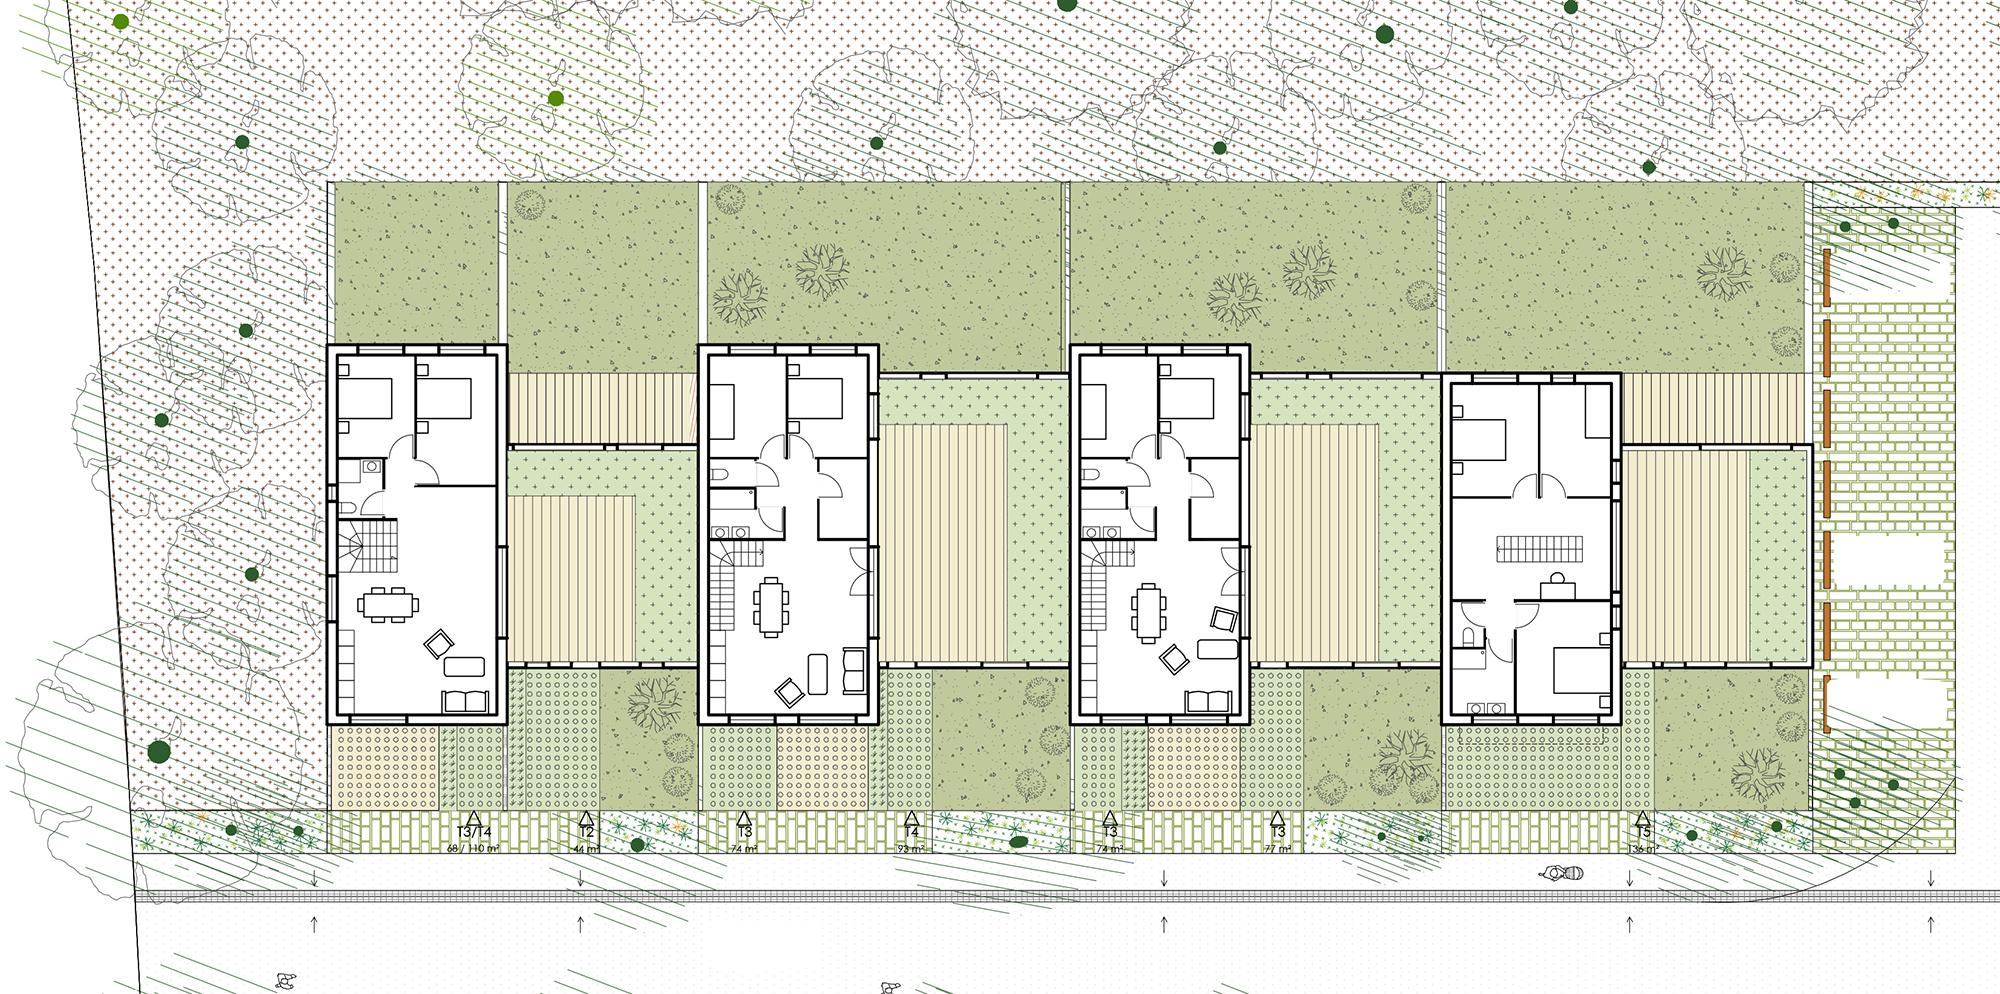 KOGI-Malville - maisons doubles - R+1